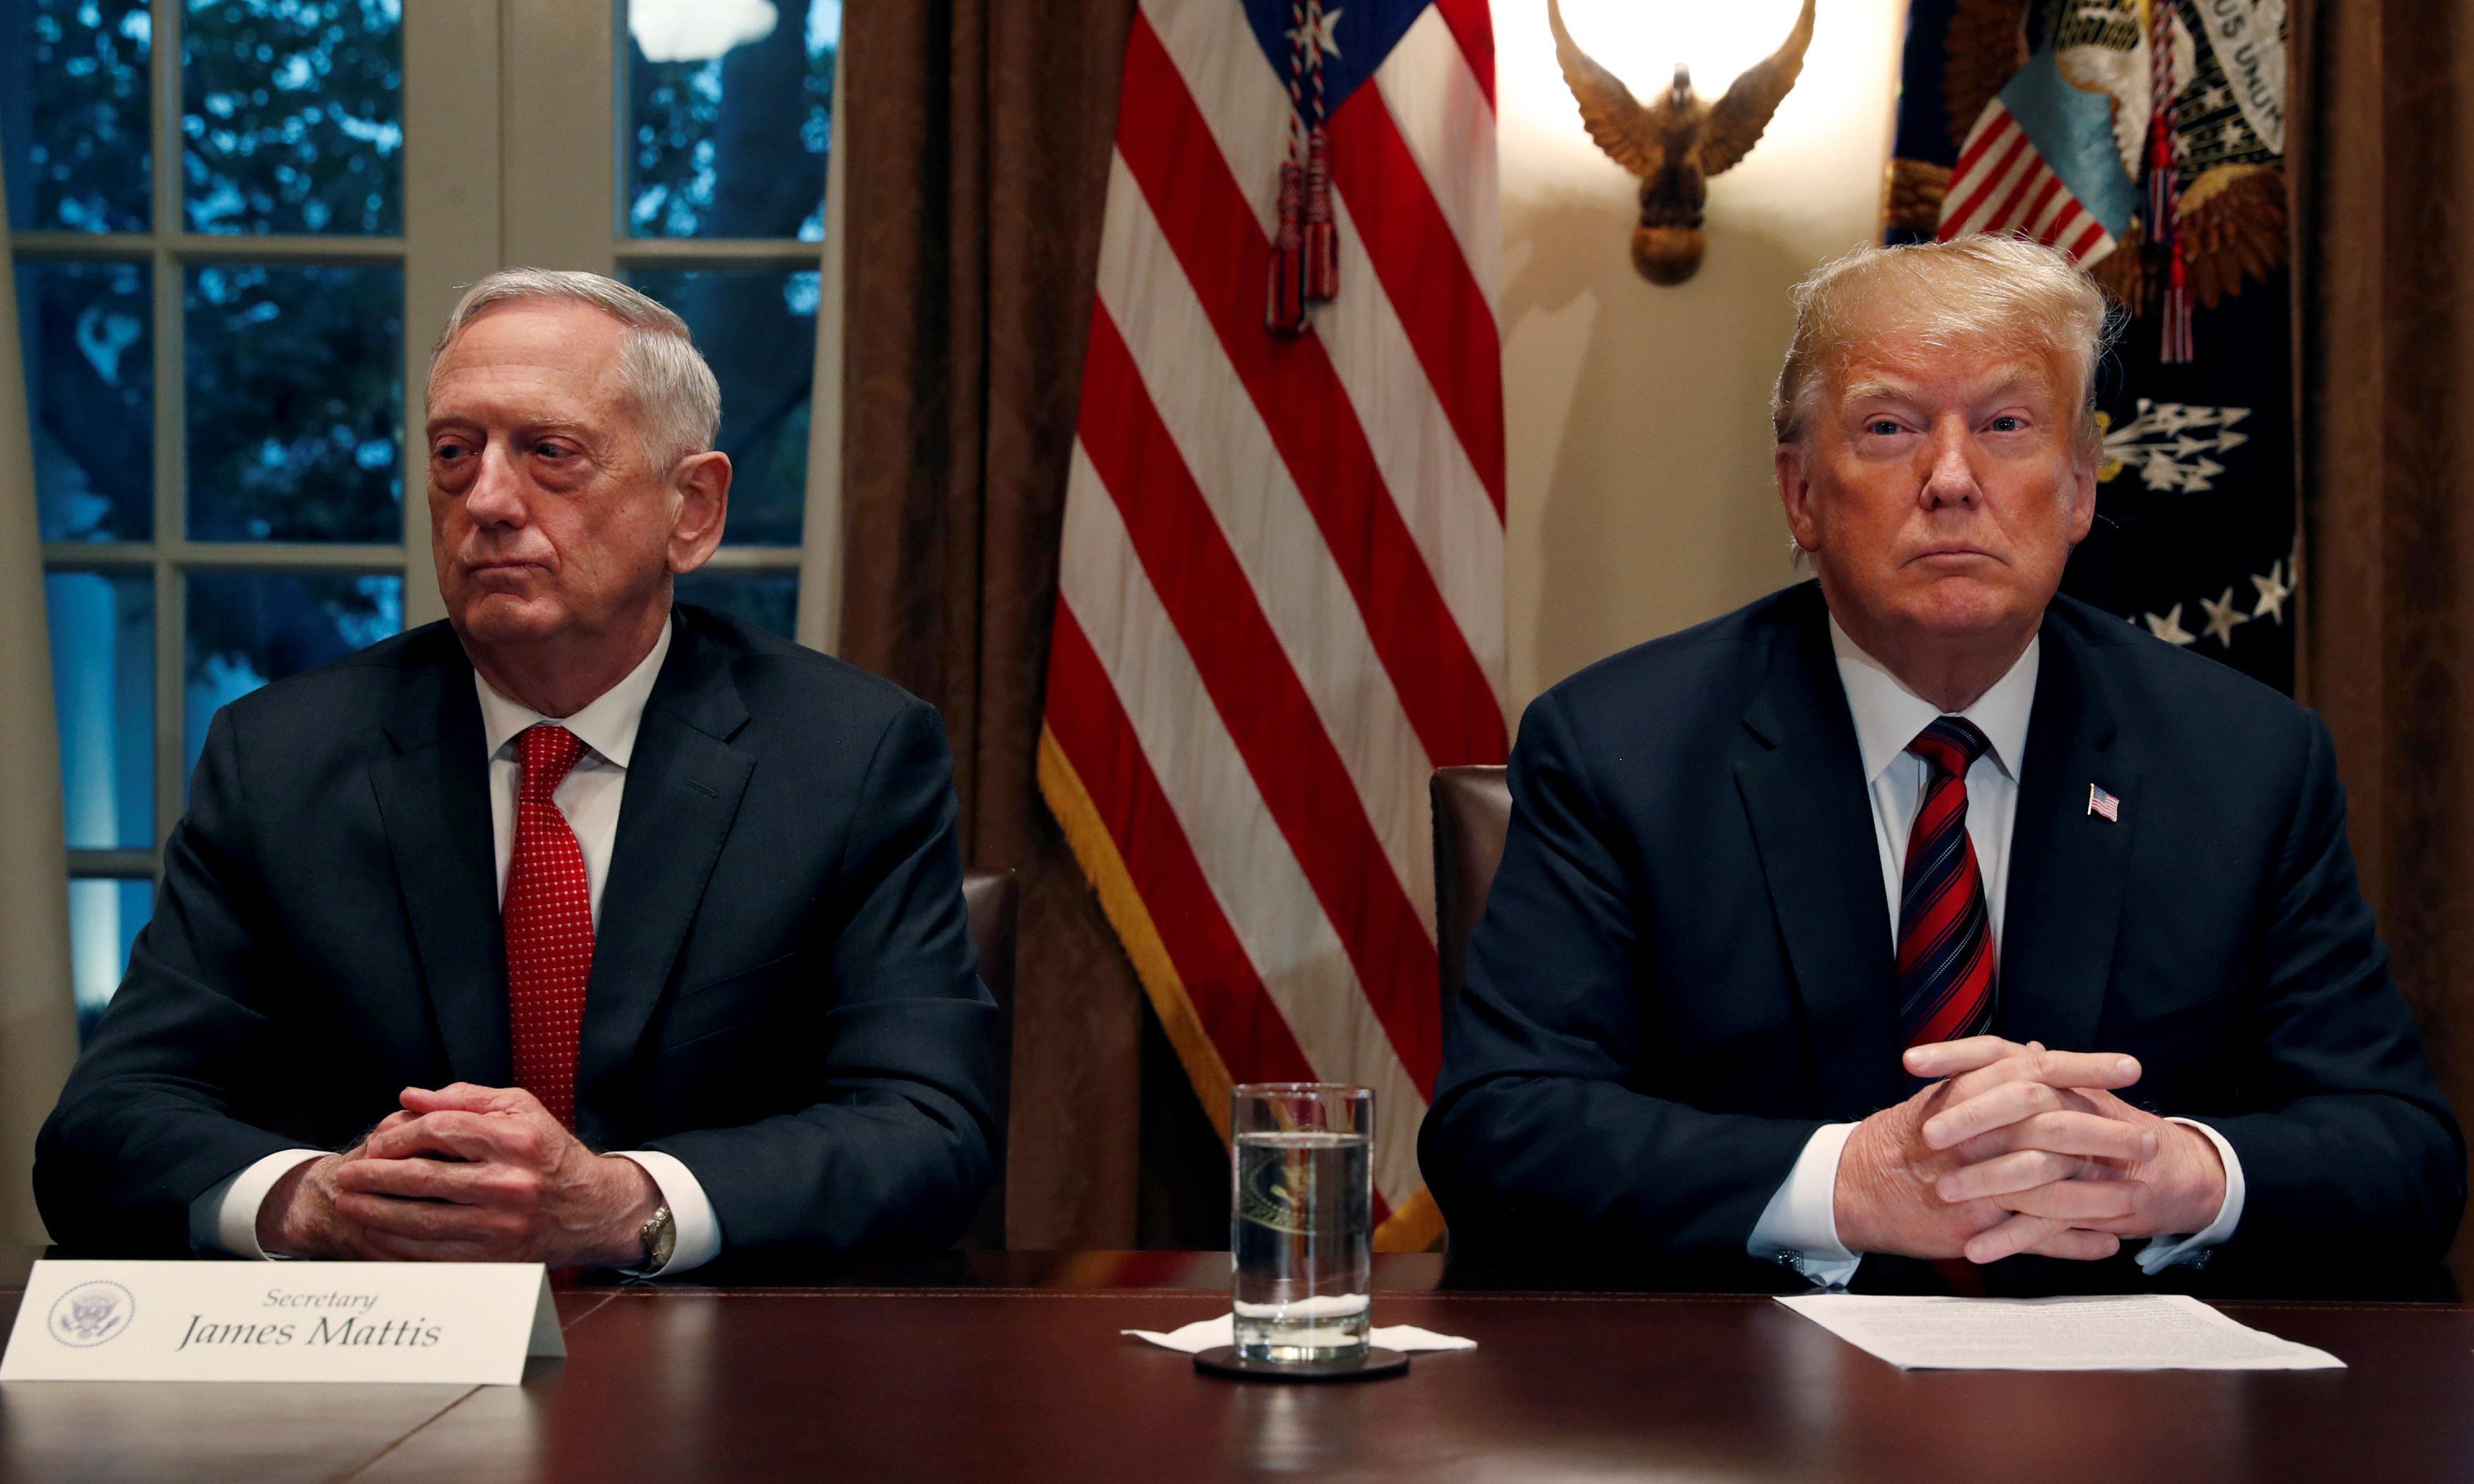 'He earned his spurs from a doctor': Gen James Mattis mocks Trump